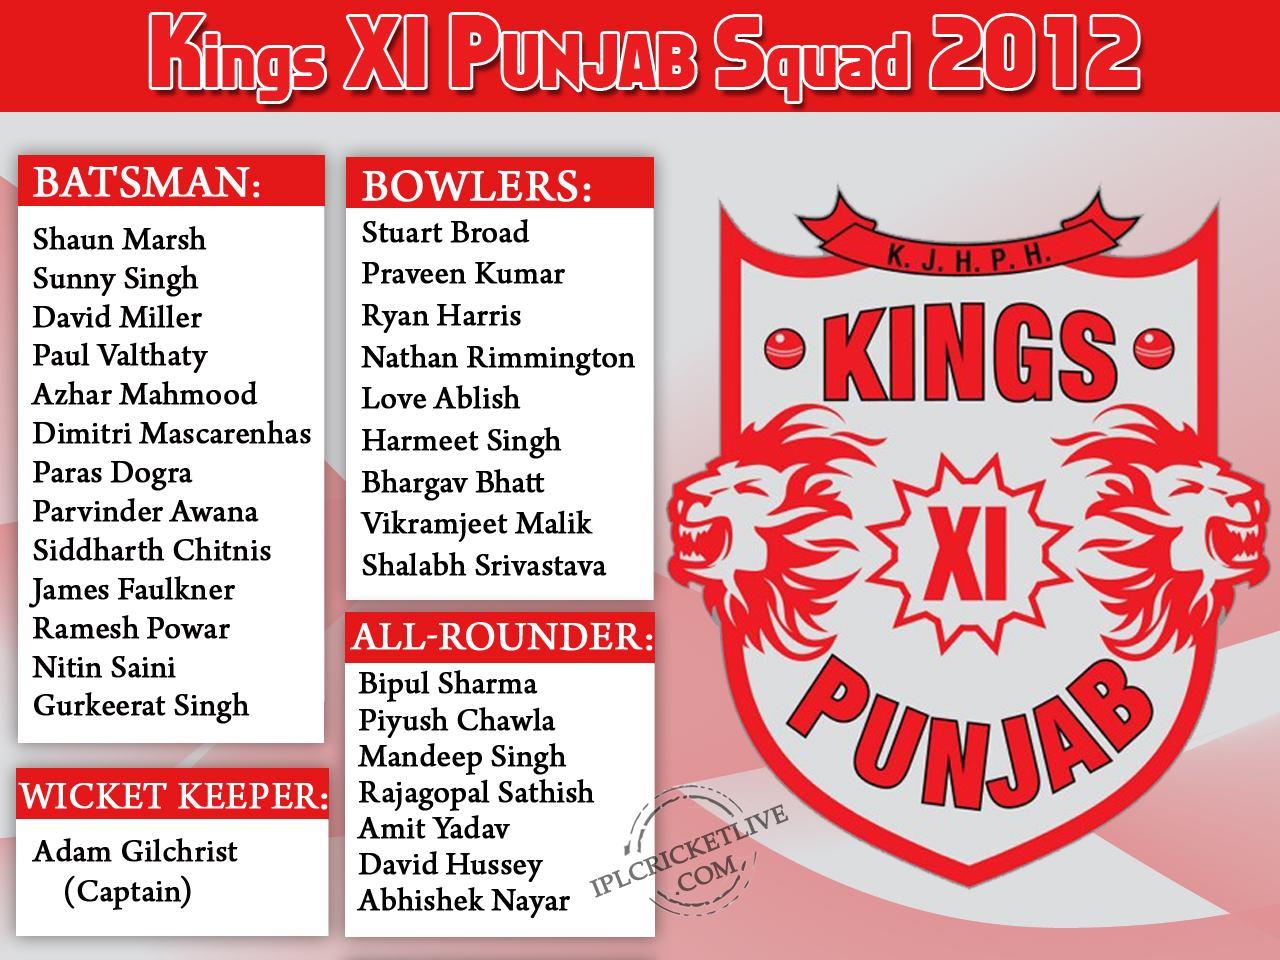 IPL 2016, Indian Premier League 2016 - Kings XI Punjab Squad 2012